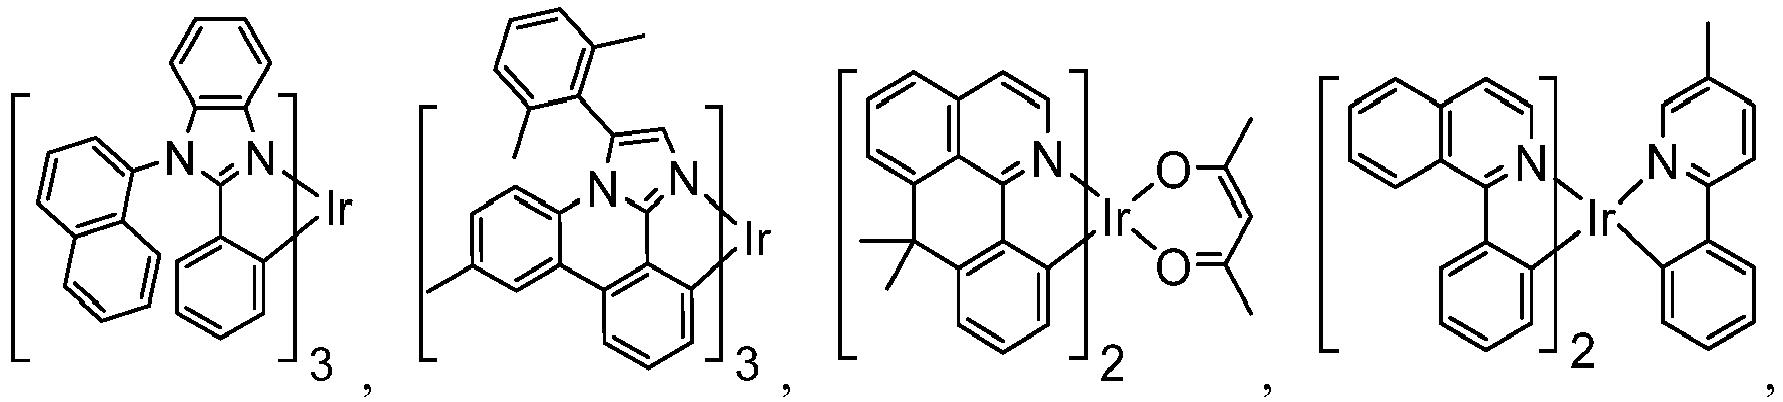 Figure imgb0936